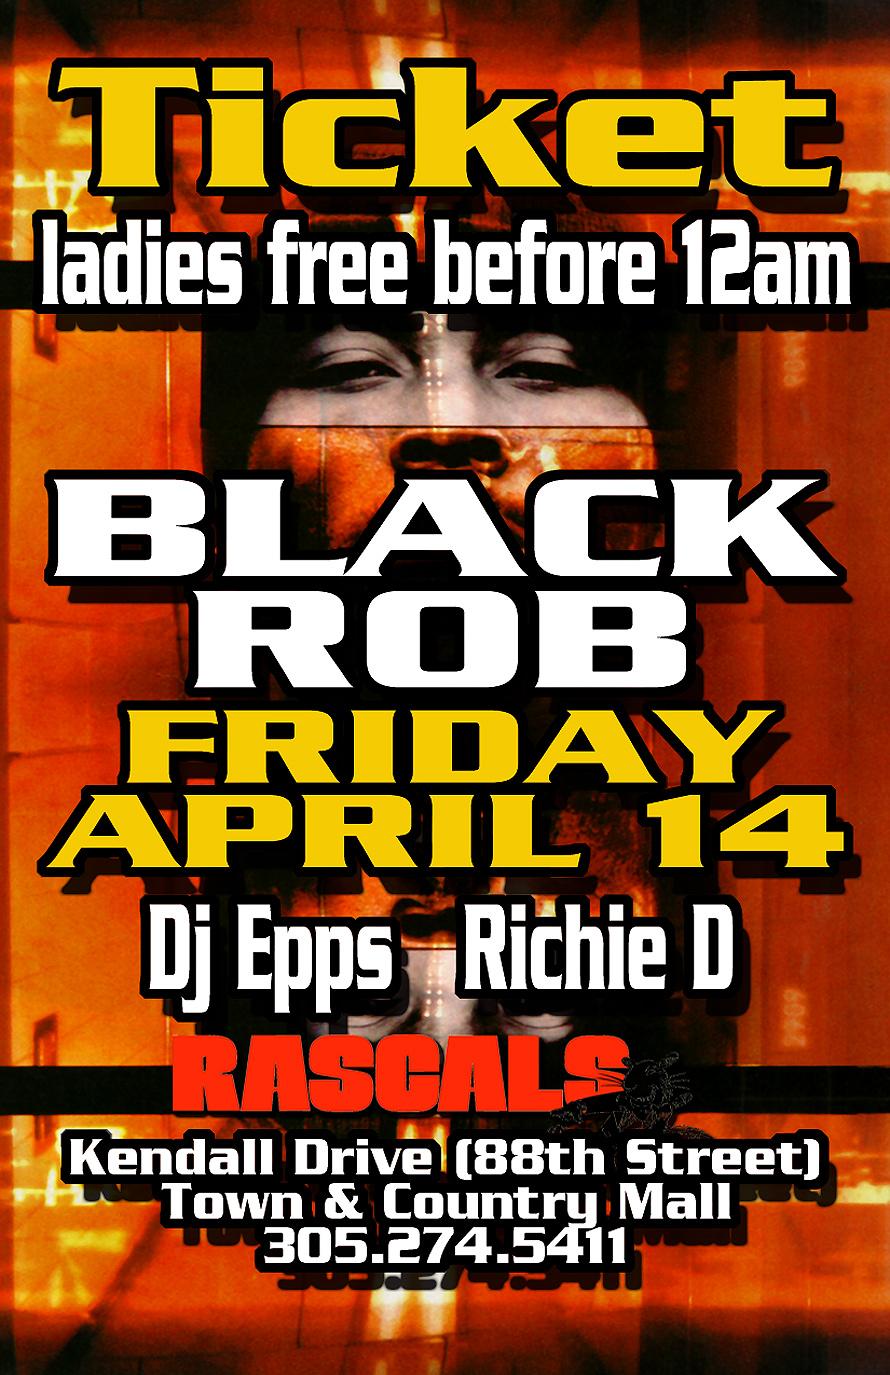 Black Rob Tickets at Rascals